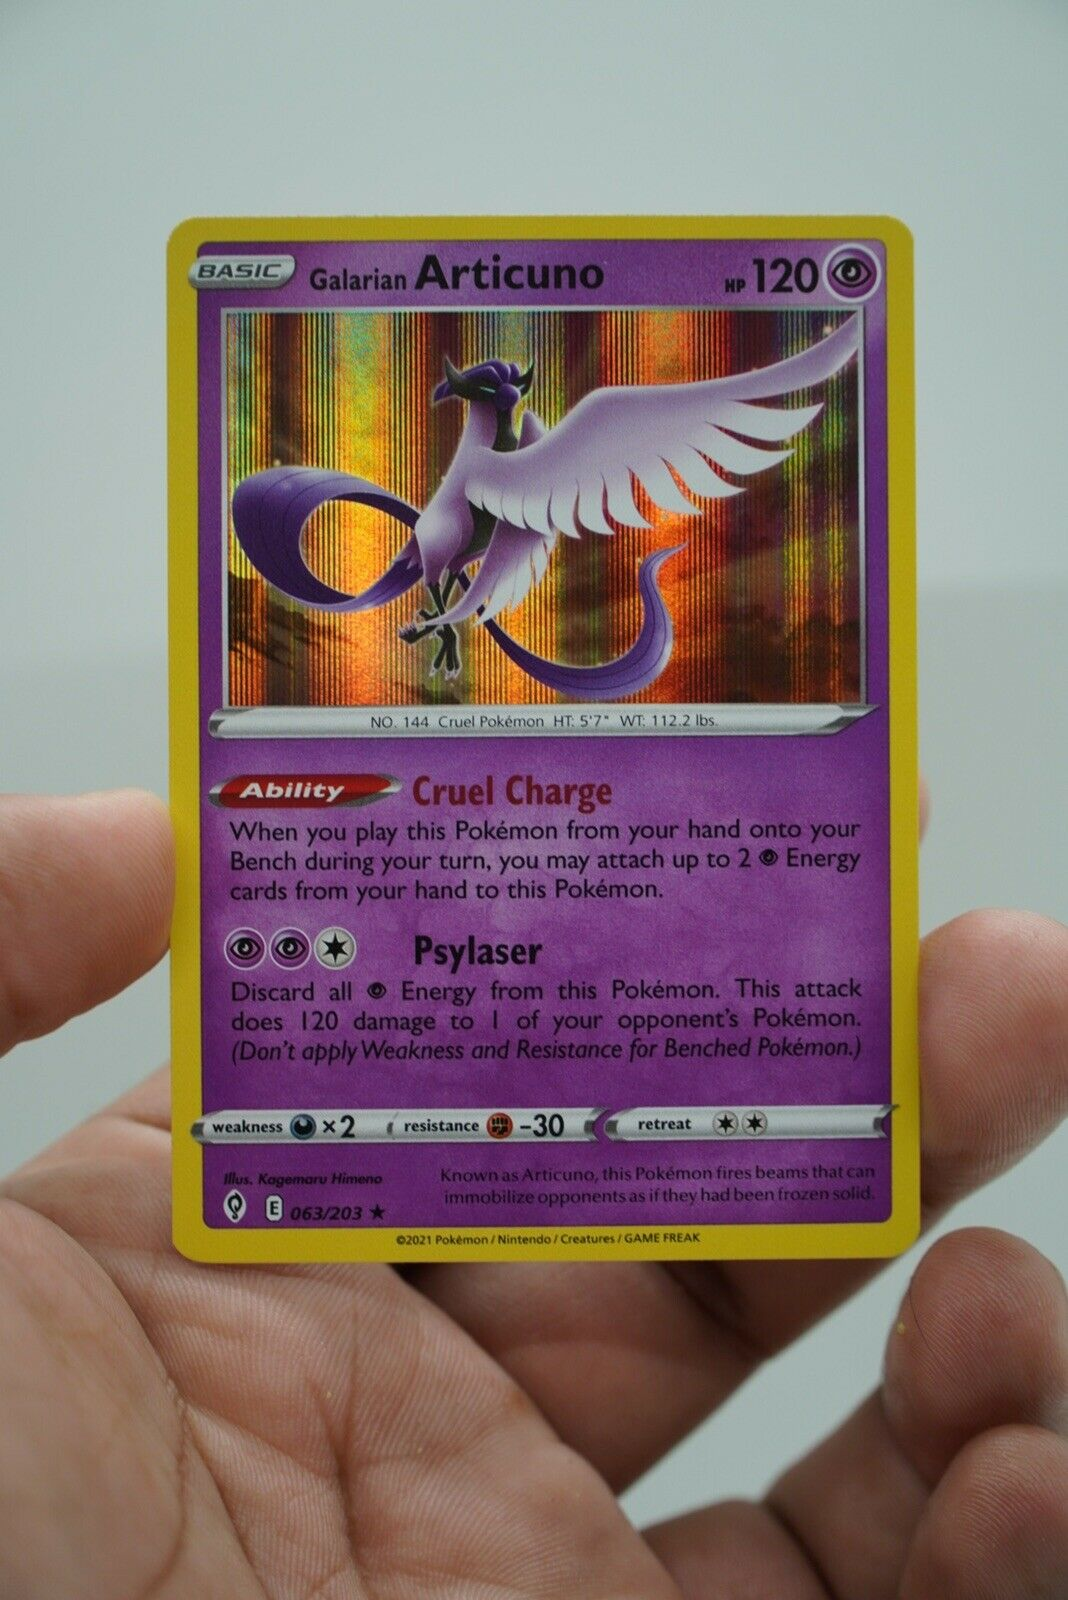 Pokemon - Galarian Articuno - 063/203 - Holo Rare - Evolving Skies - New